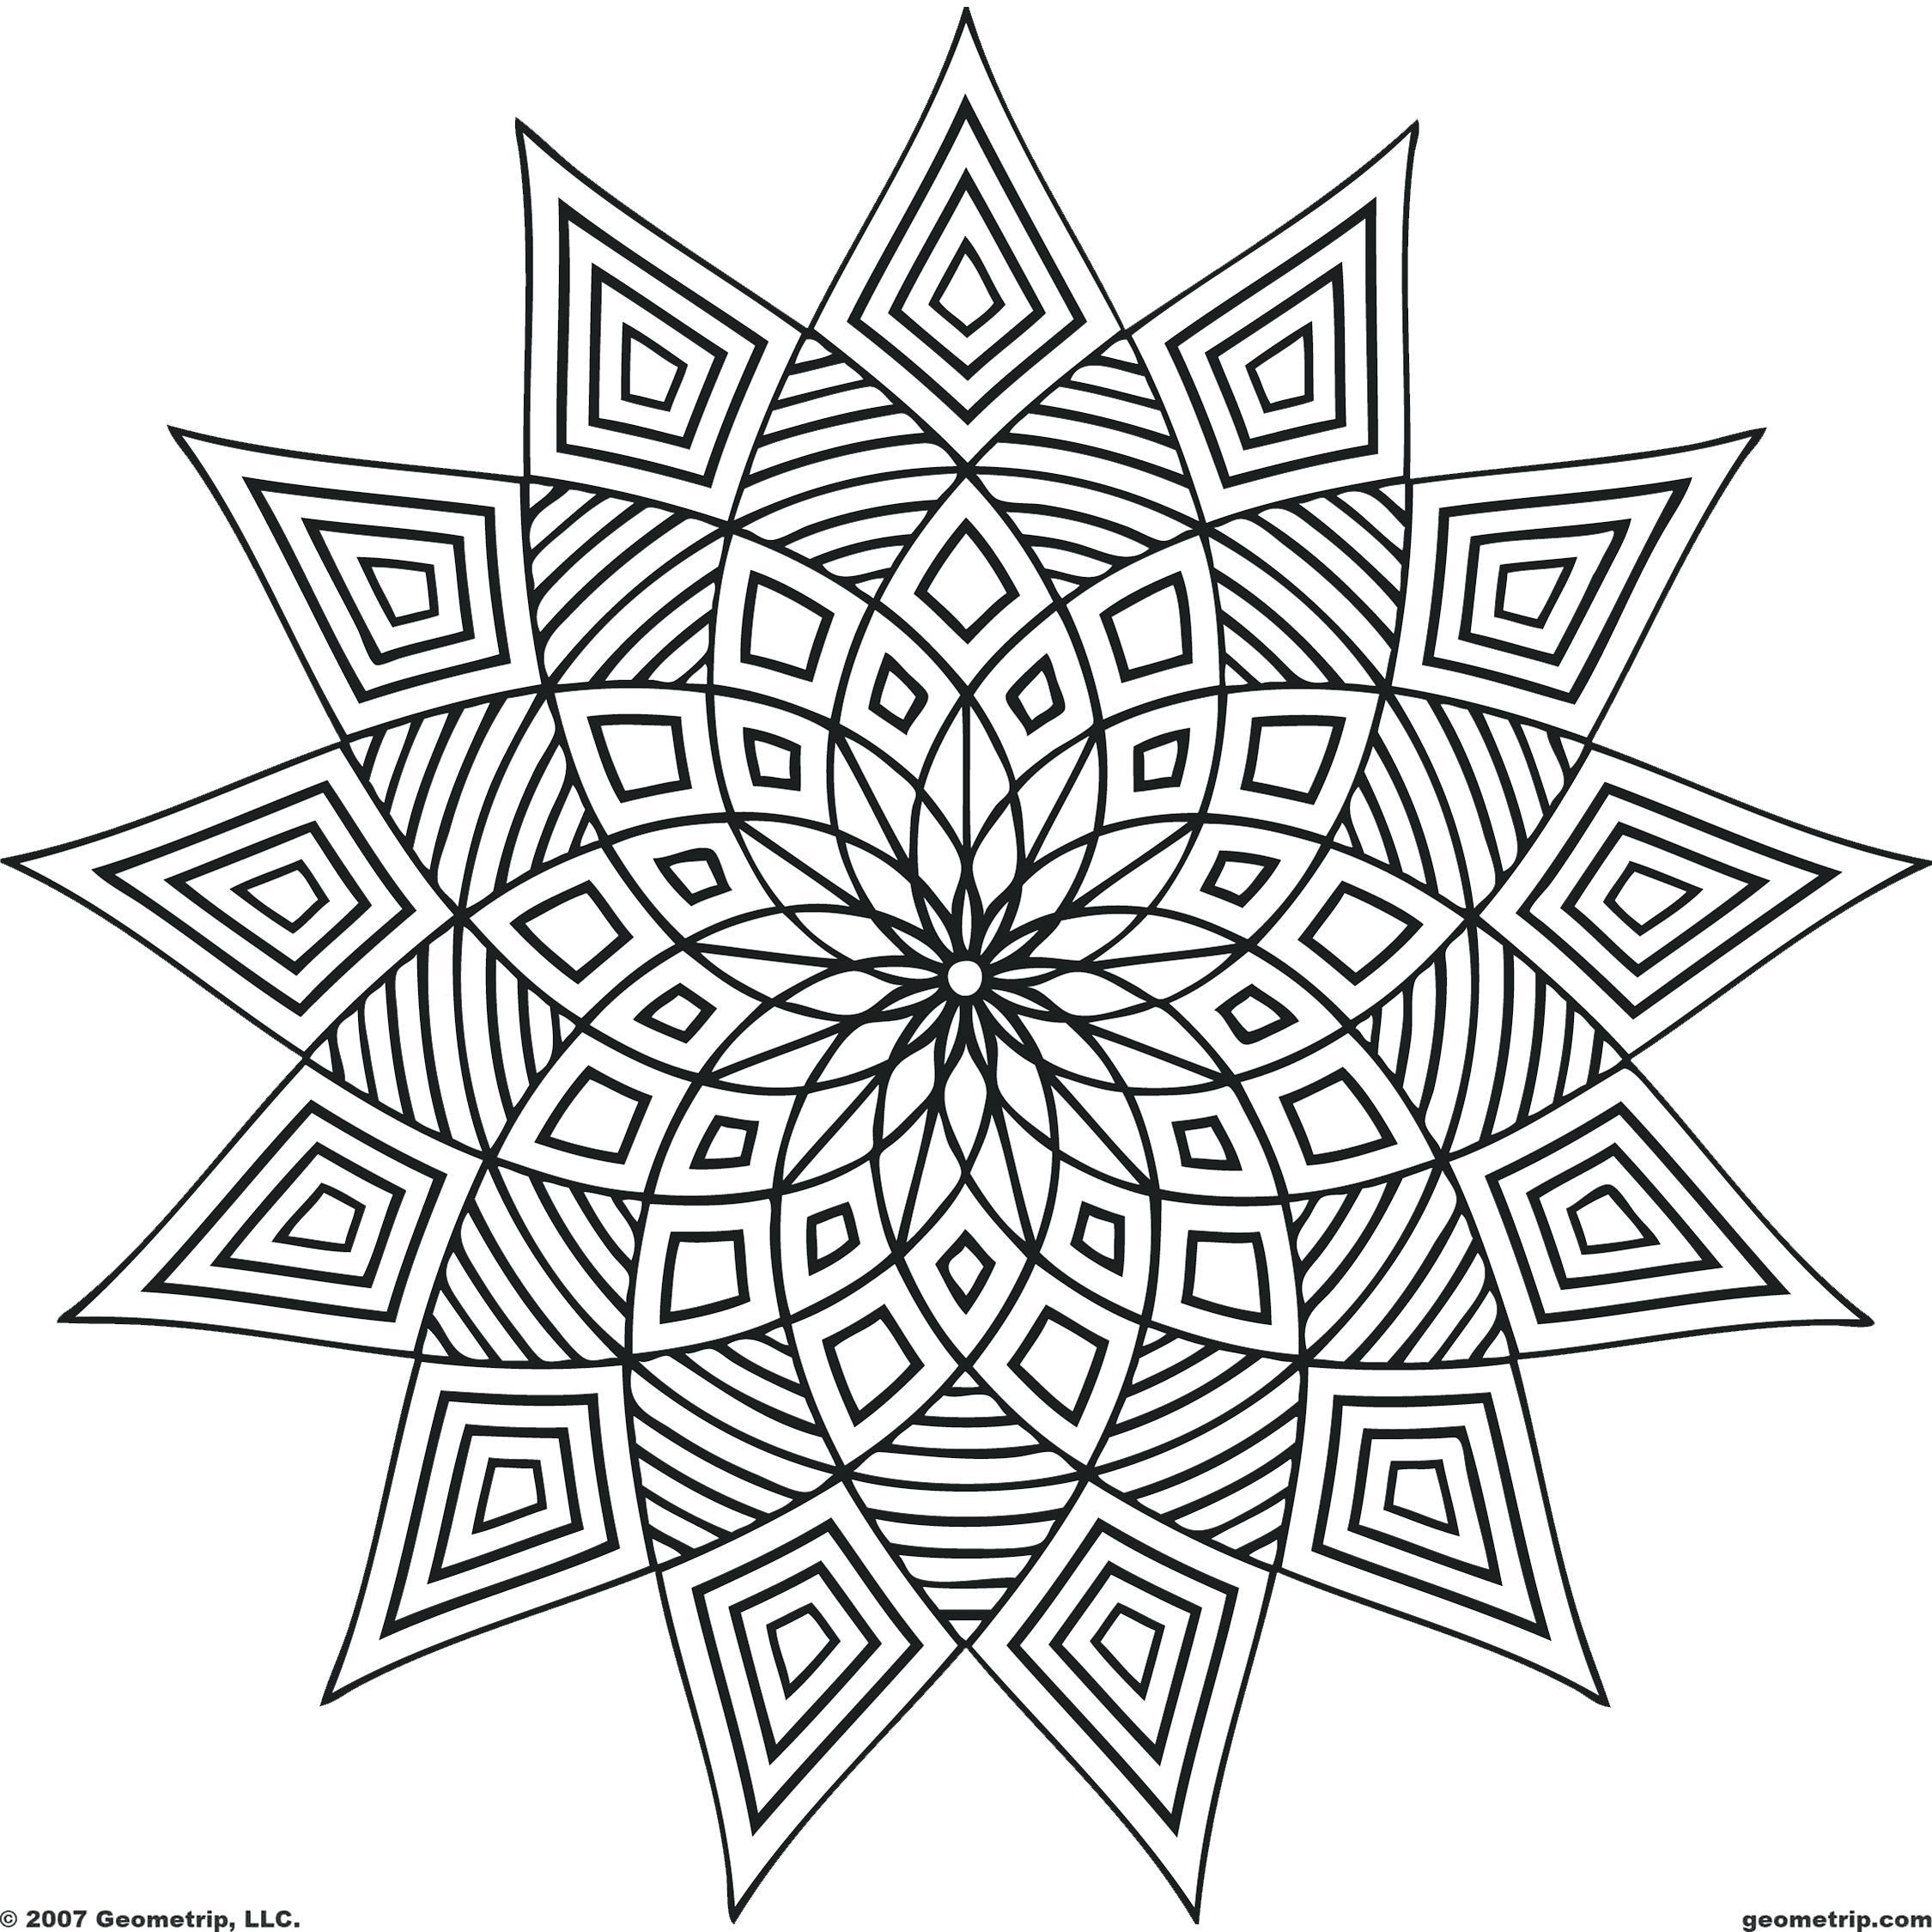 2250x2250 Printable Symmetrical Drawing Pages Printable Luxury Kaleidoscope